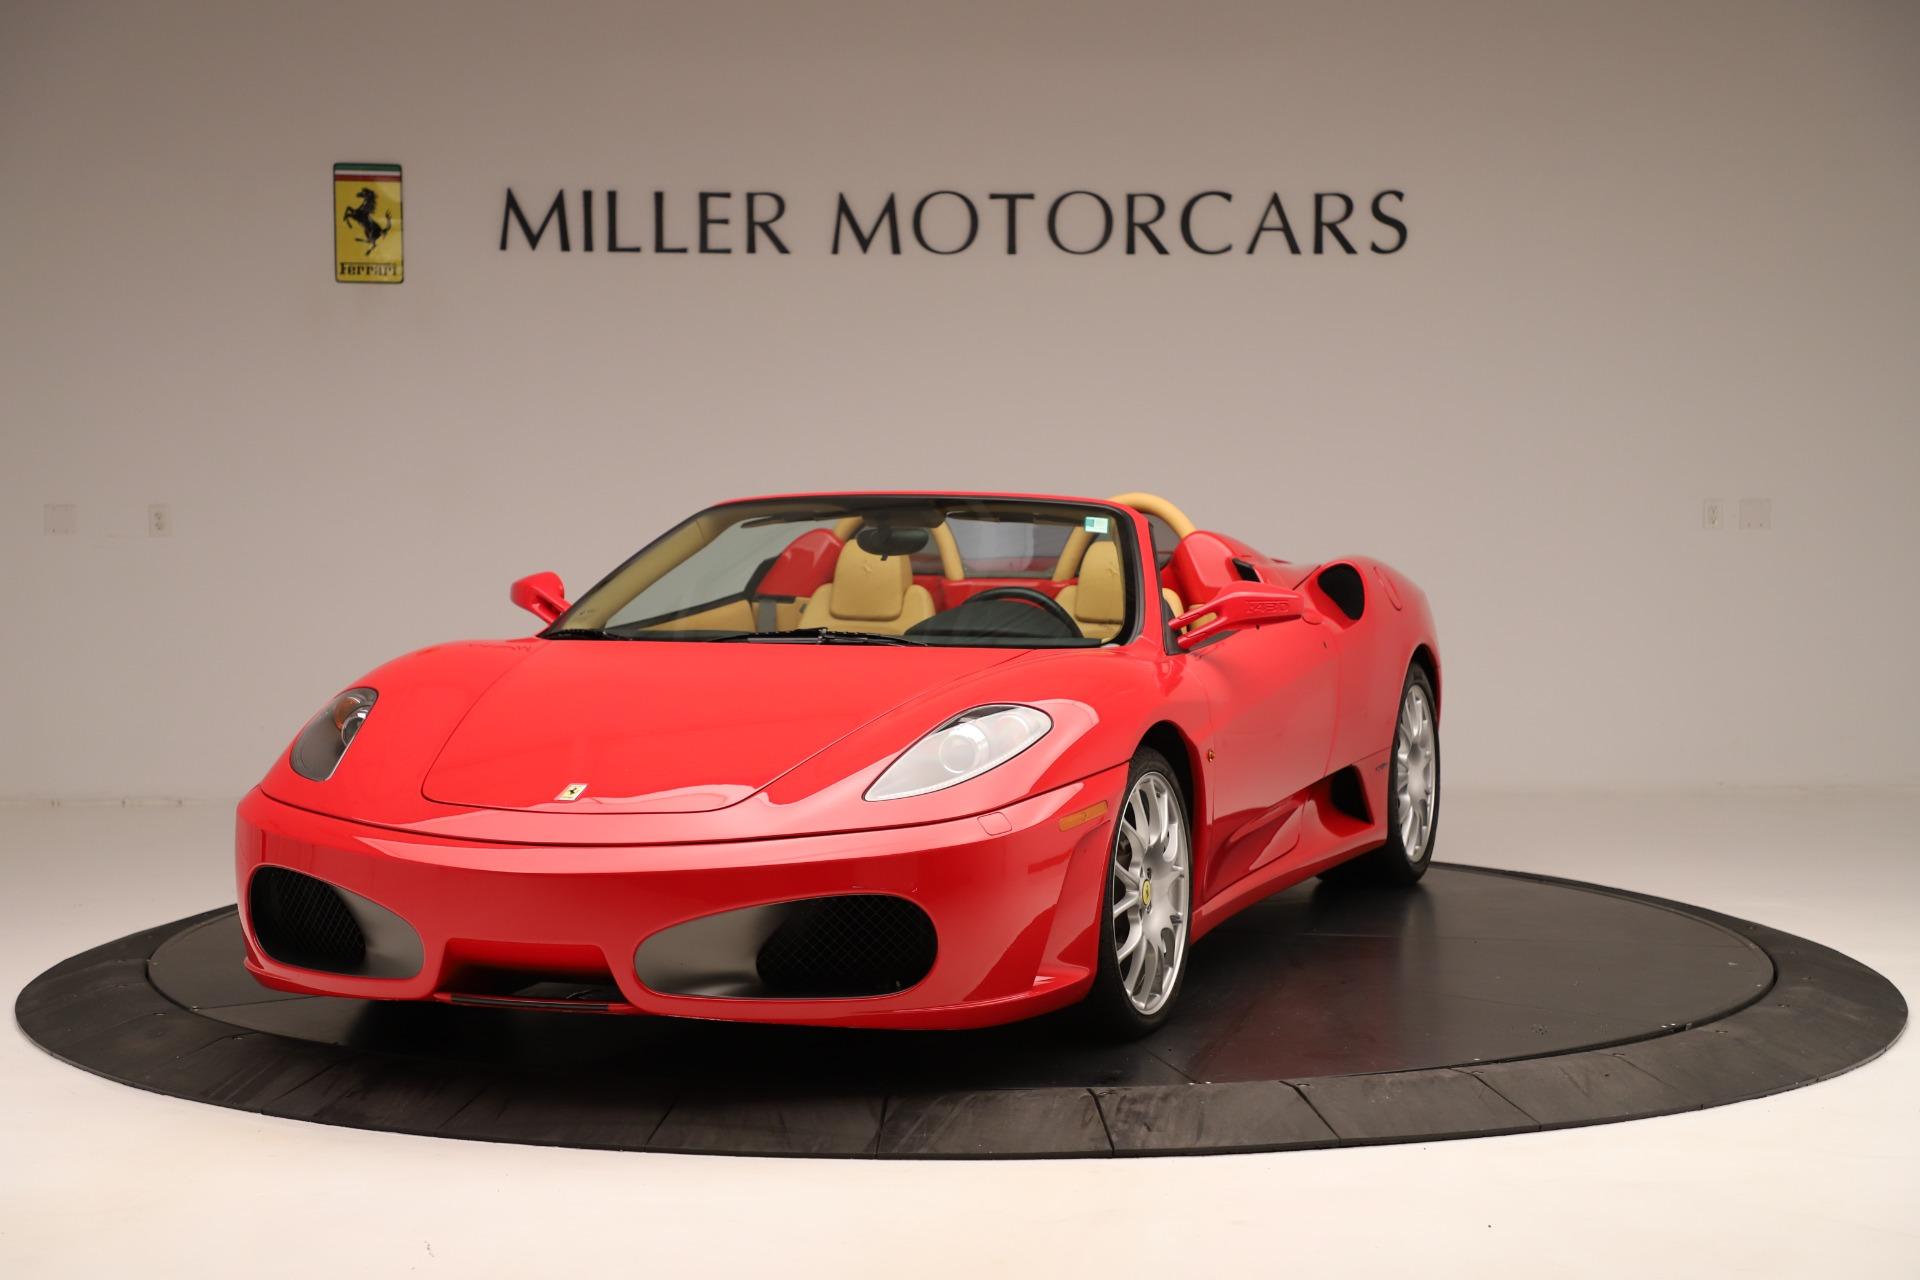 Used 2007 Ferrari F430 F1 Spider for sale Sold at Alfa Romeo of Westport in Westport CT 06880 1